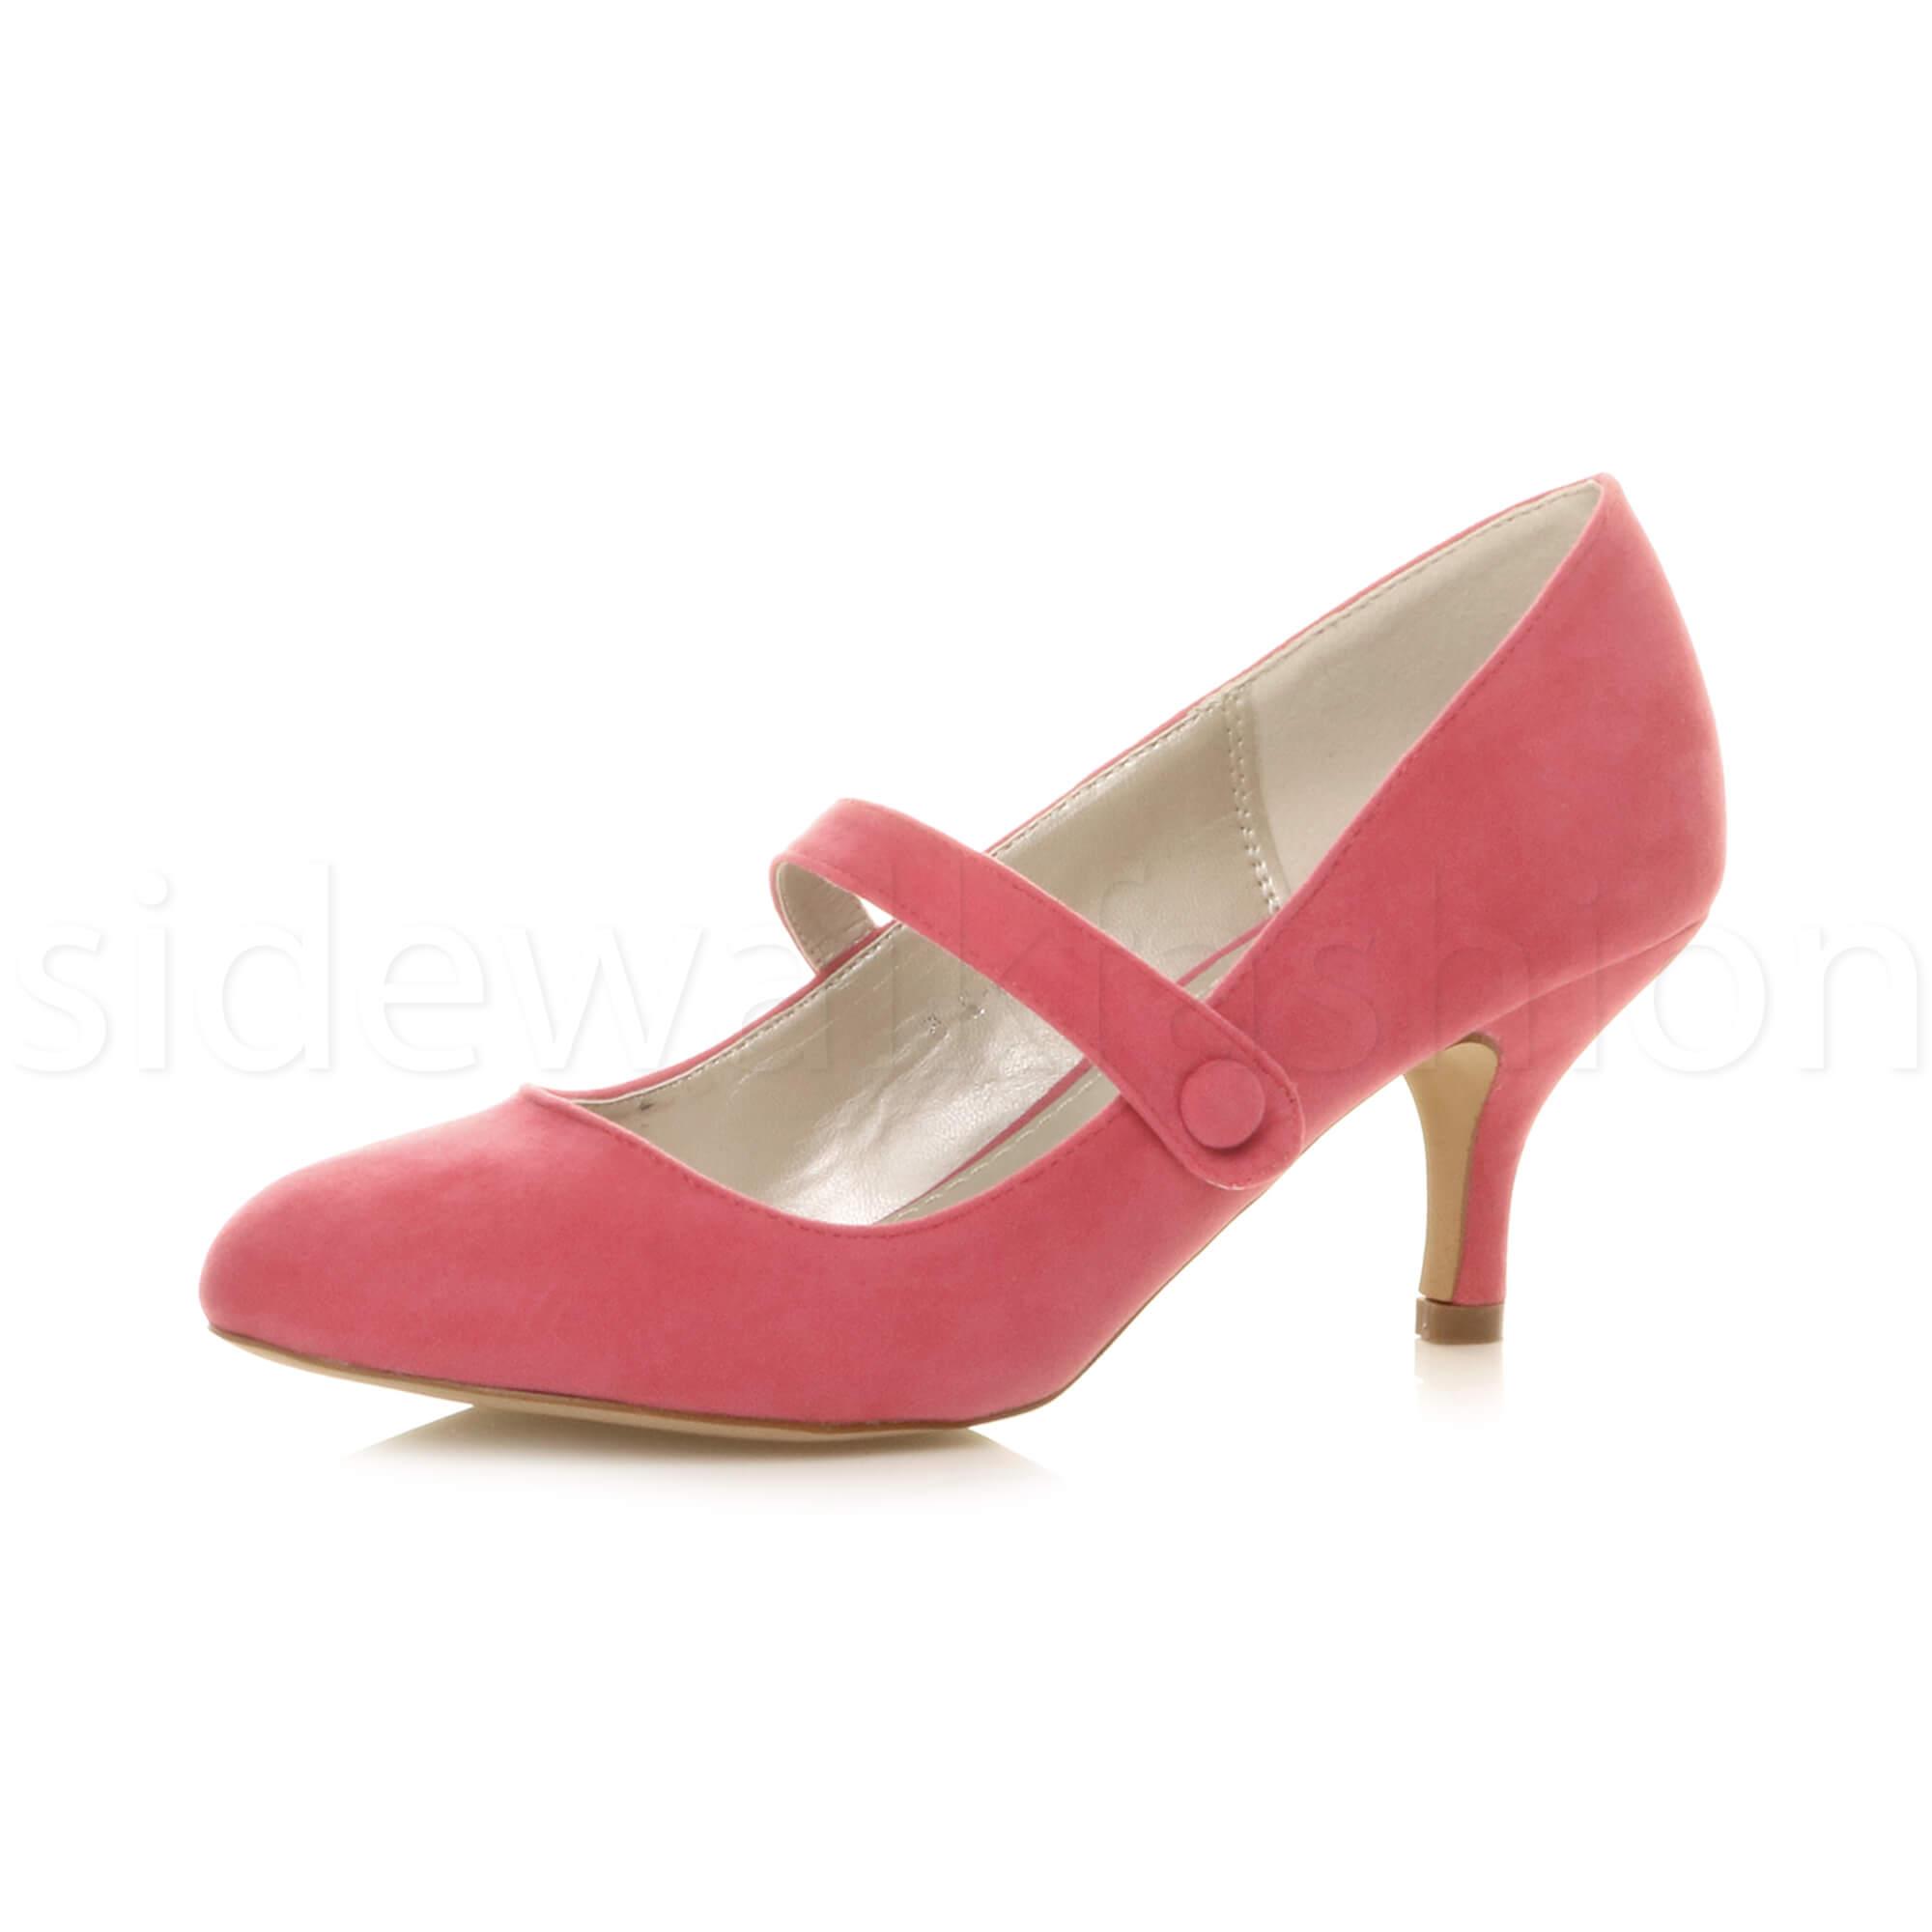 Black Suede Medium Heel Court Shoes